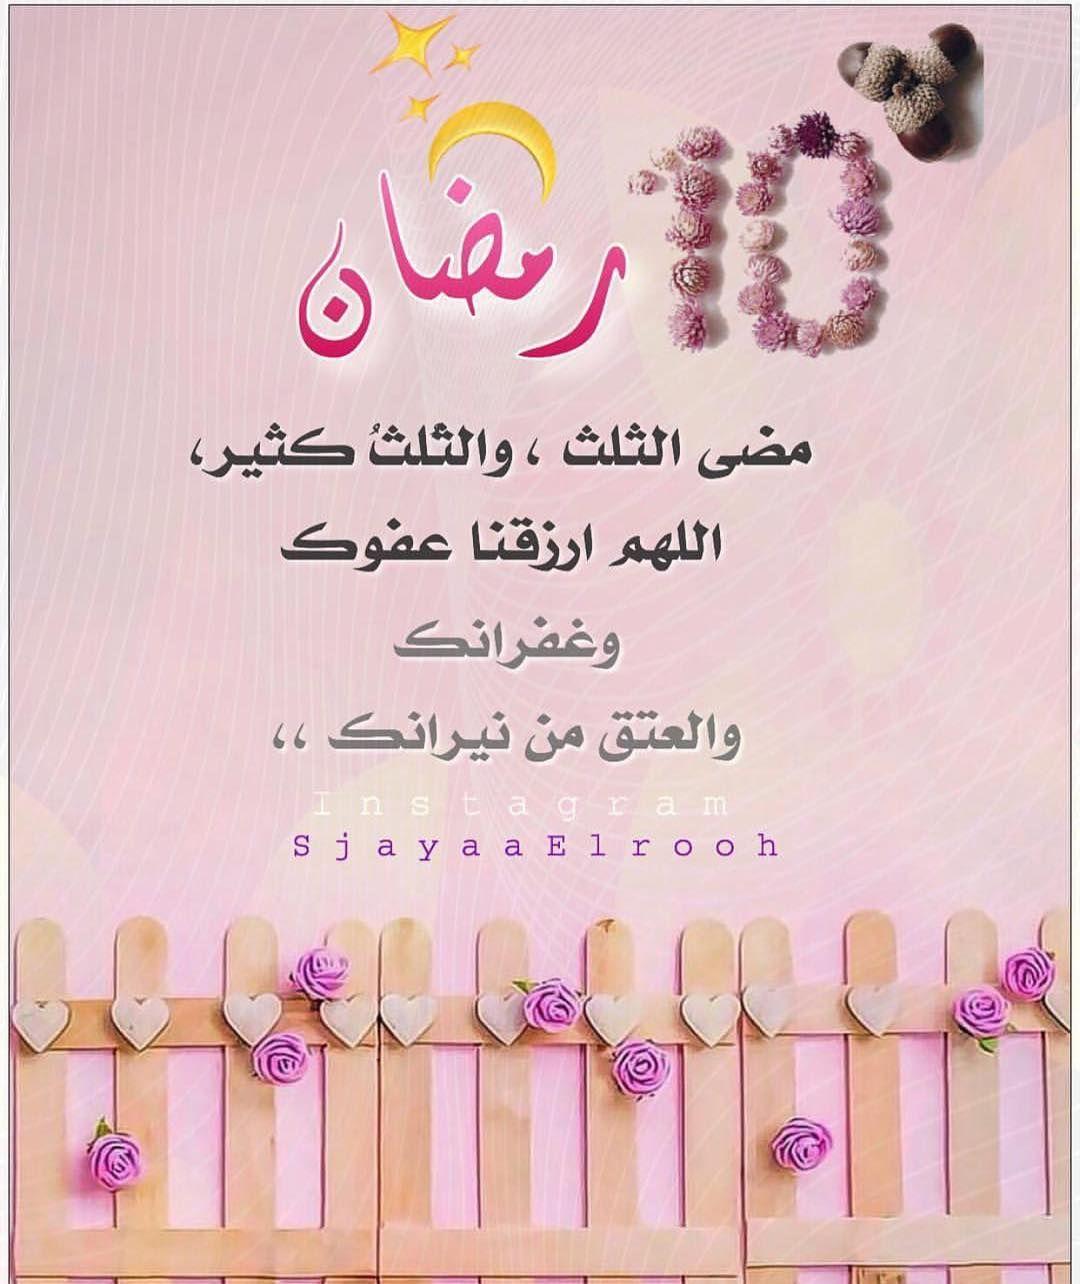 94 Likes 3 Comments Aℓi Ali Asm85 On Instagram حمدا لك يا الله على كل مانحن فيه Ramadan Quotes Ramadan Mubarak Wallpapers Ramadan